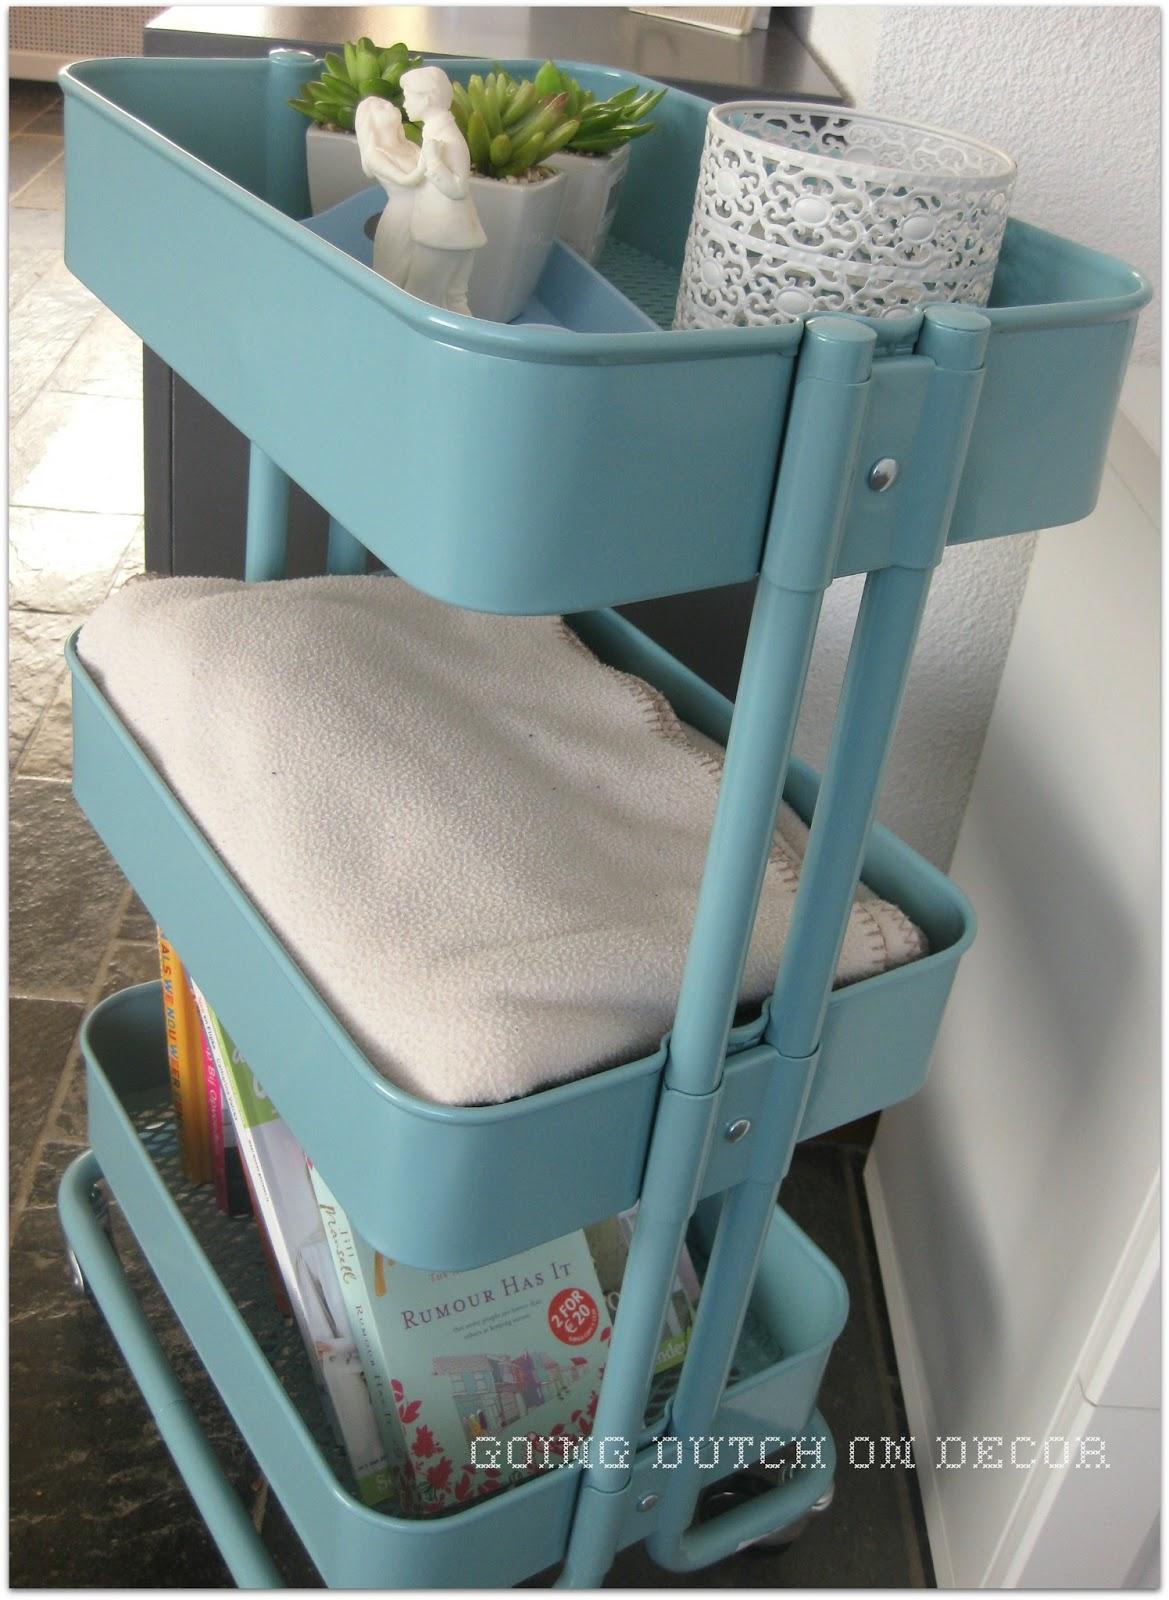 Ikea keuken roltafel: home keukens keukeneilanden roltafels.